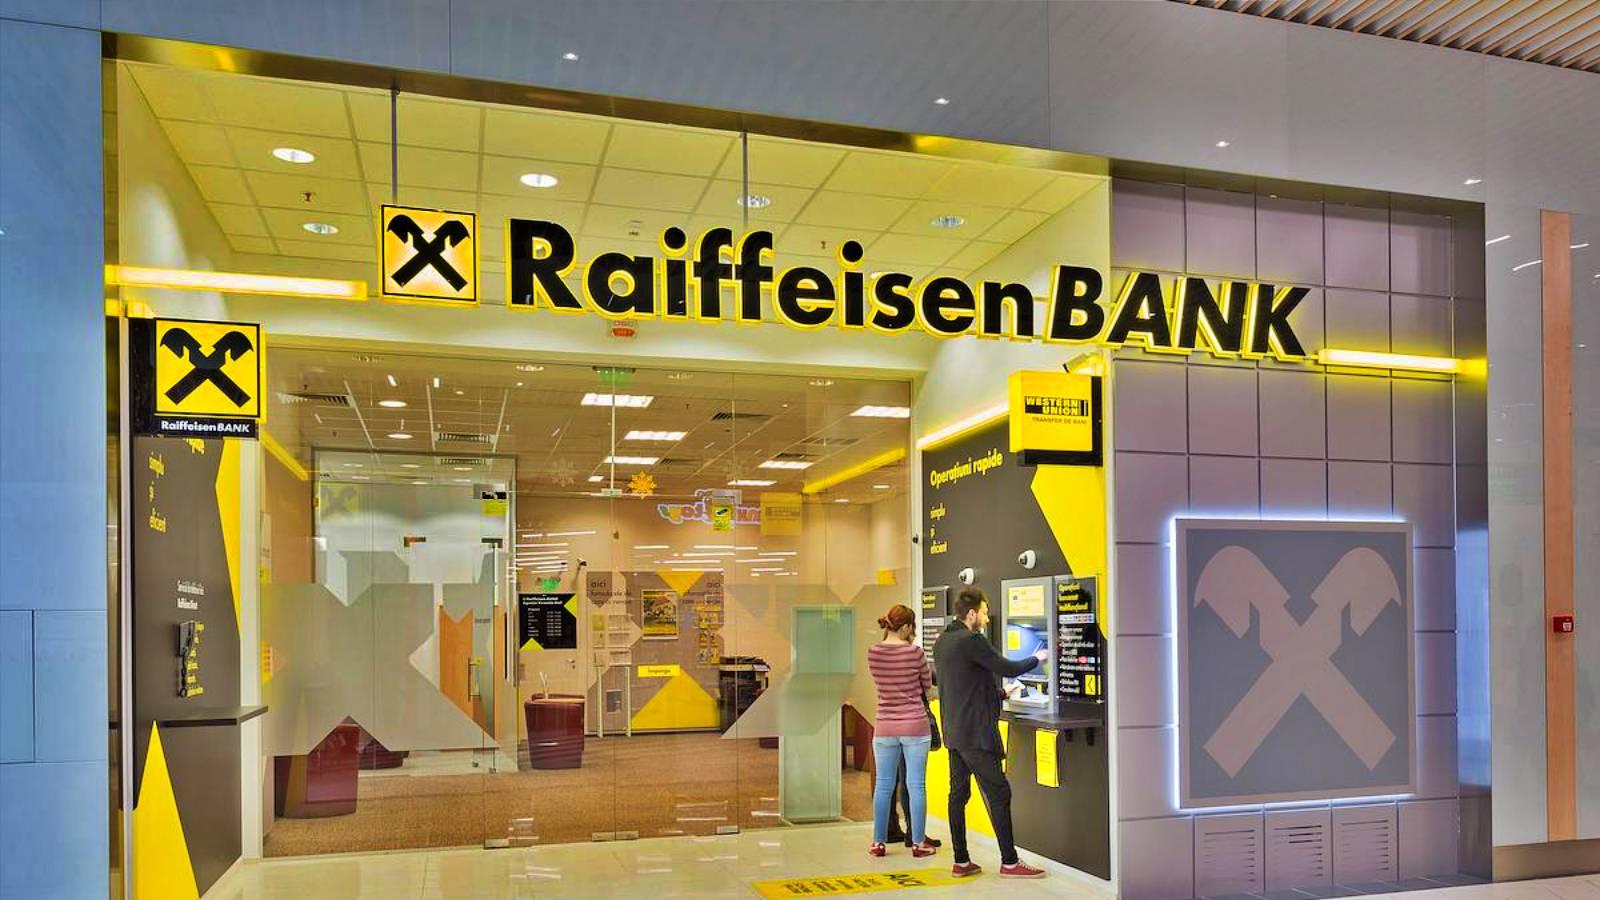 Raiffeisen Bank incident